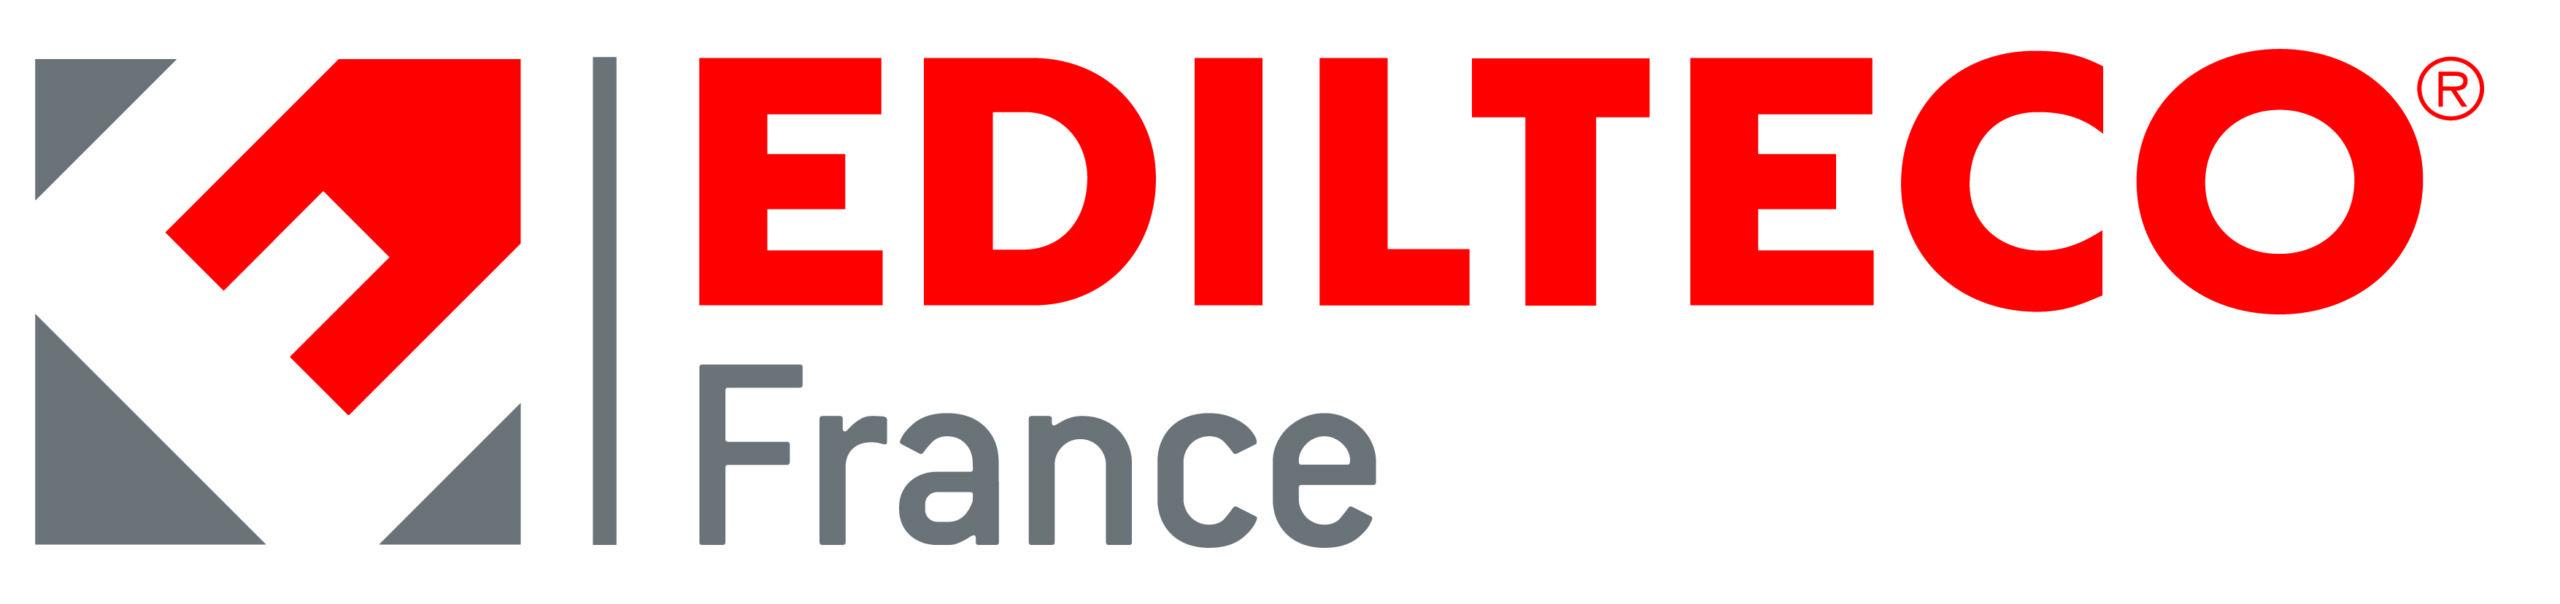 logo-EDILTECO